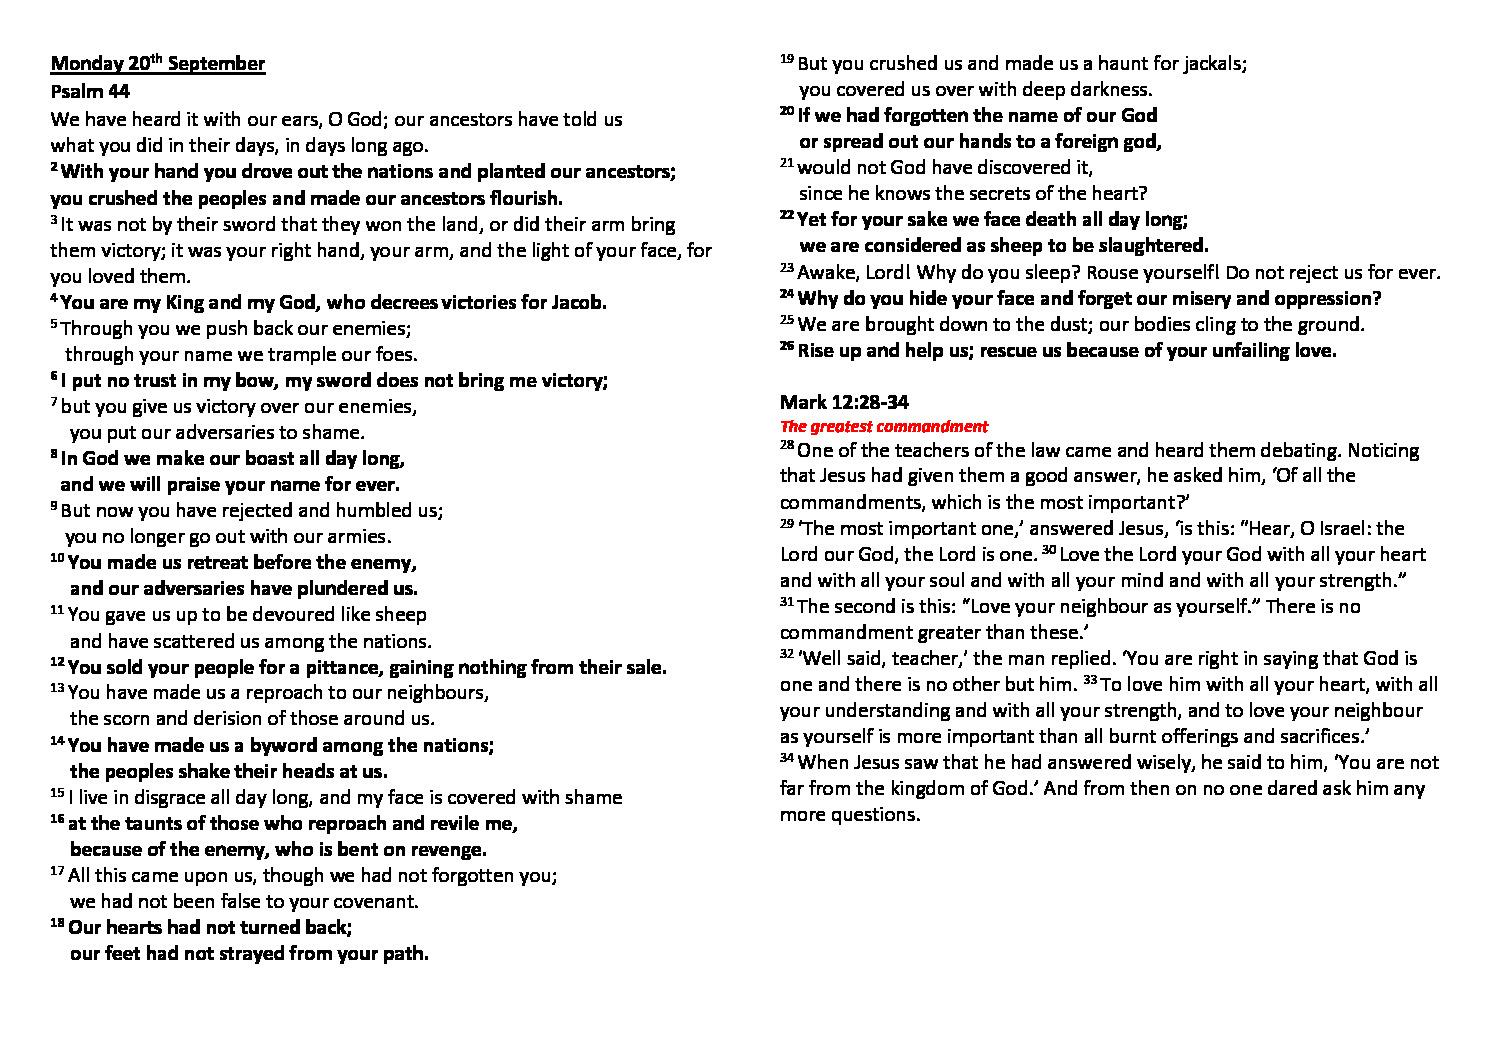 thumbnail of Morning Prayer and Psalms Monday 20th September – Saturday 25th September